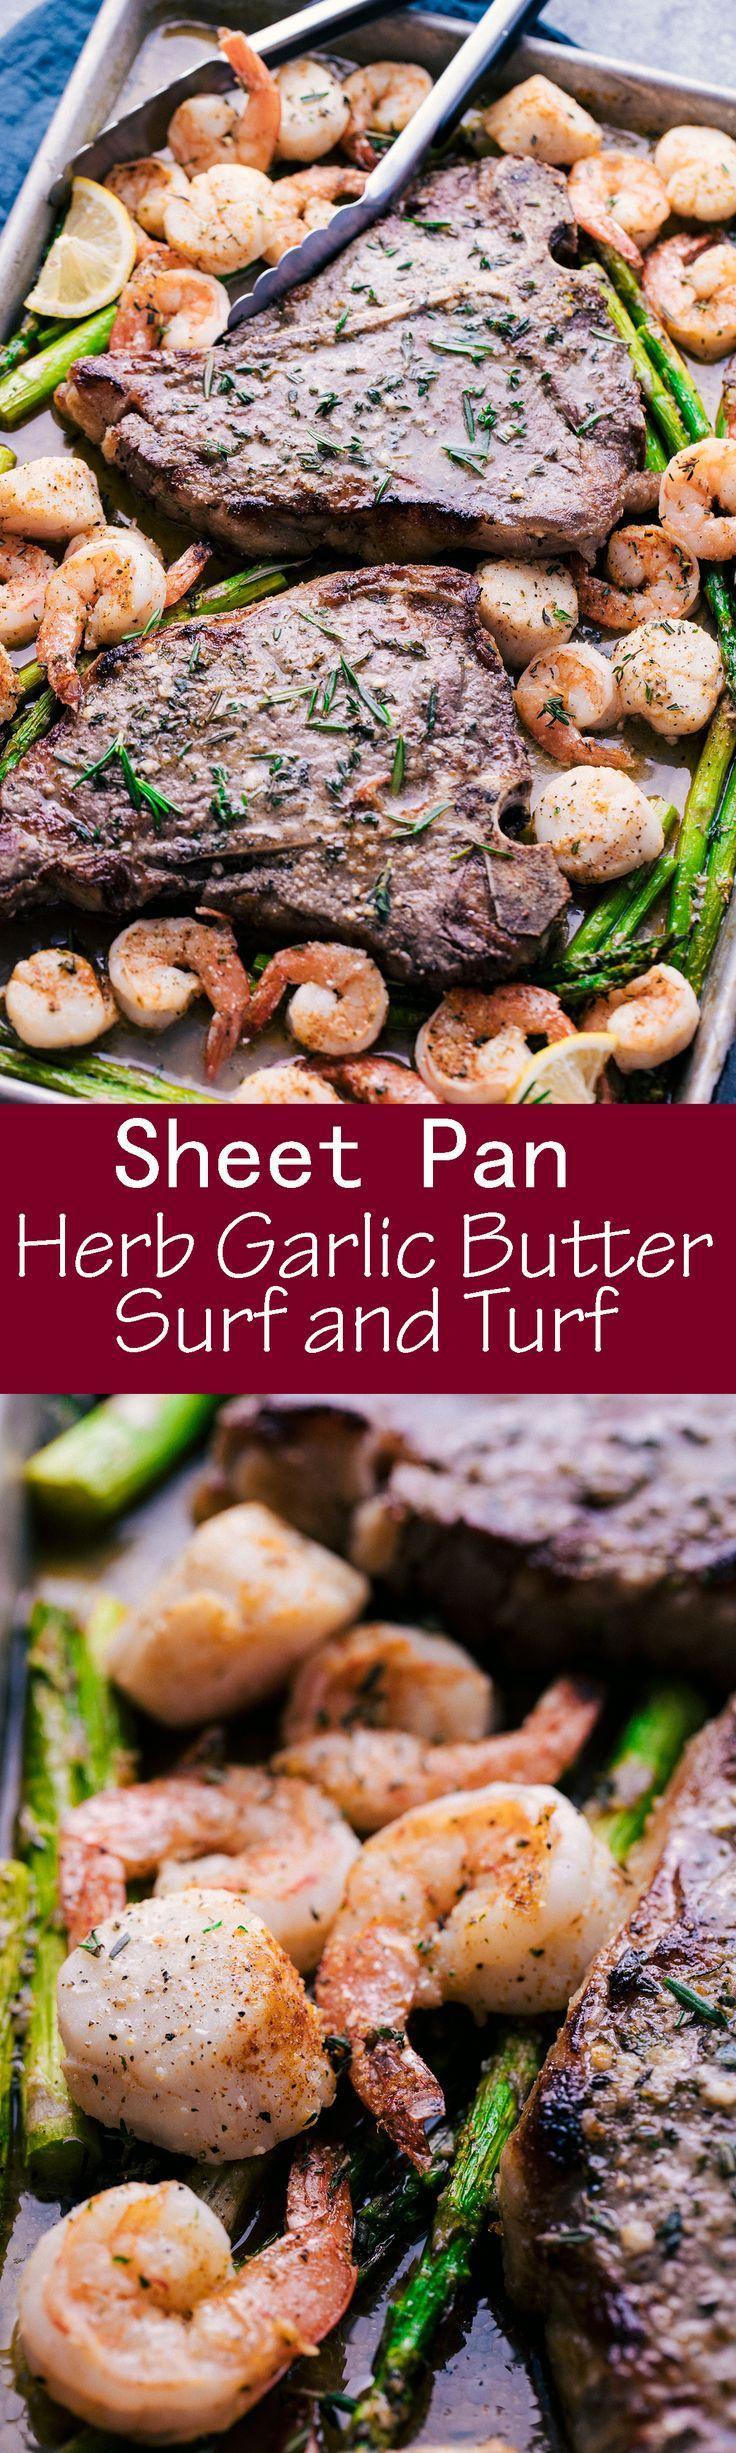 SHEET PAN HERB GARLIC BUTTER SURF AND TURF